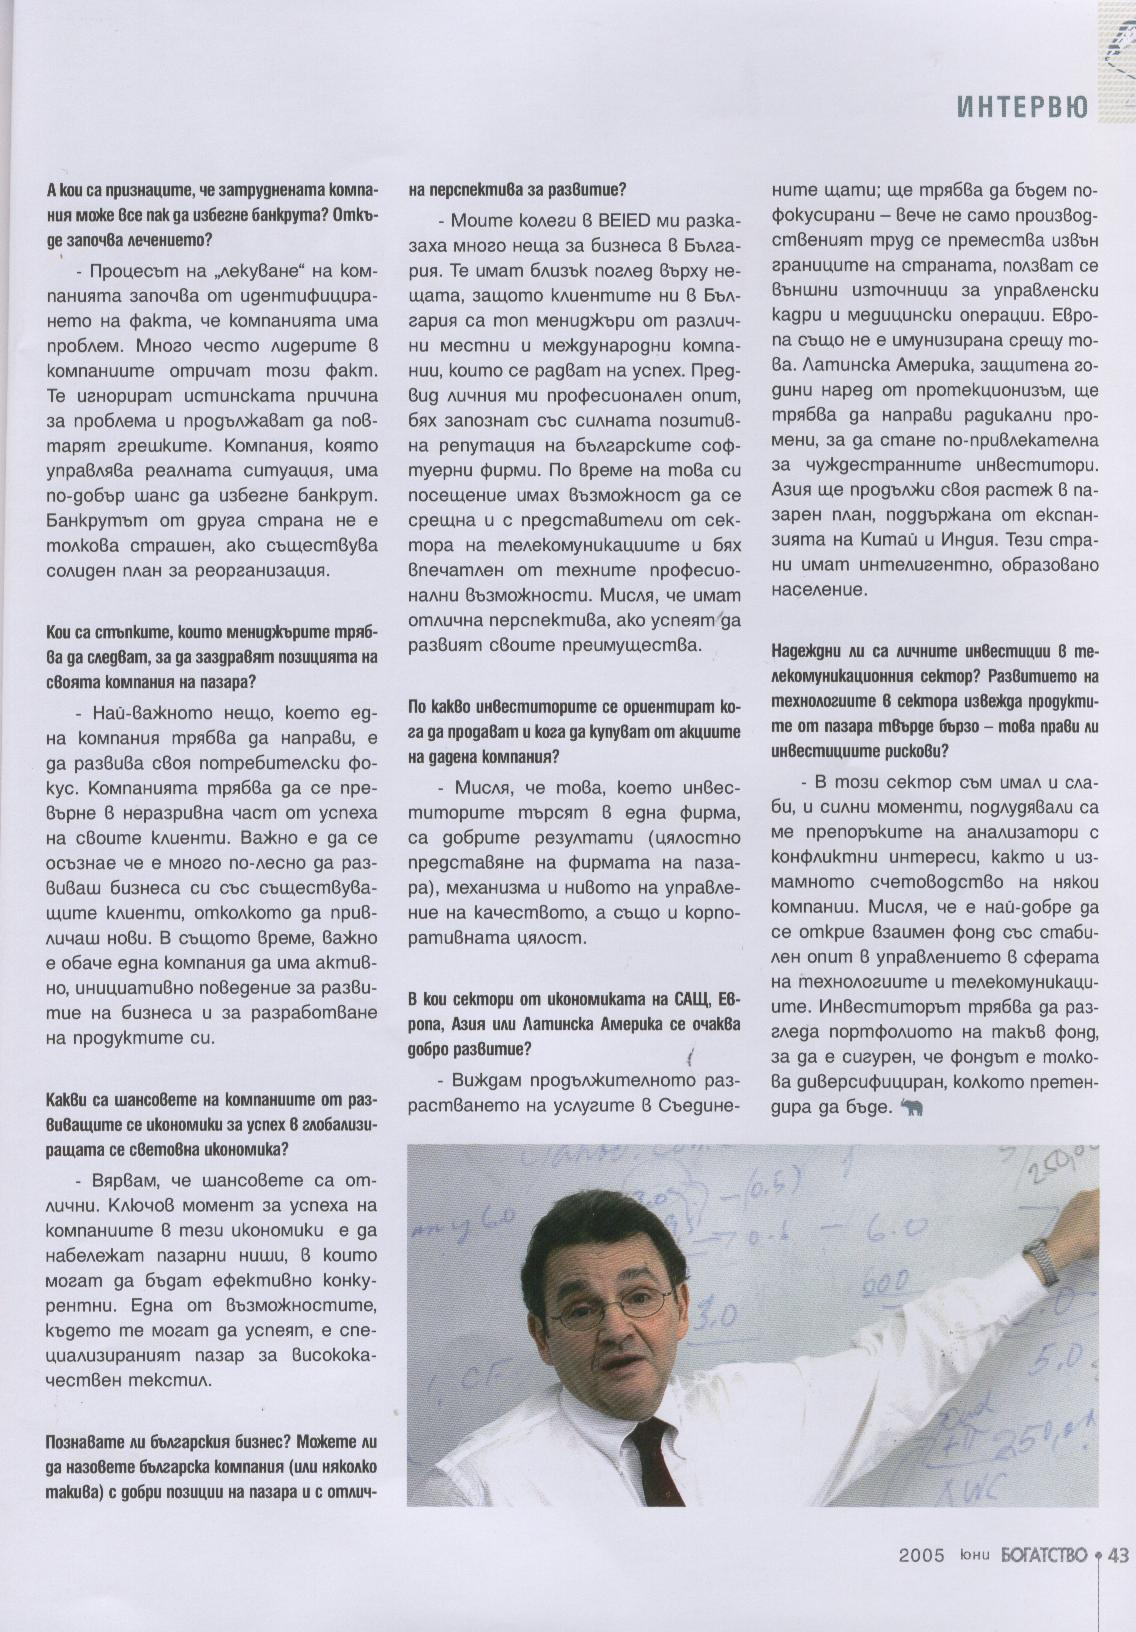 Joseph Vogel in Bogatstvo magazine2